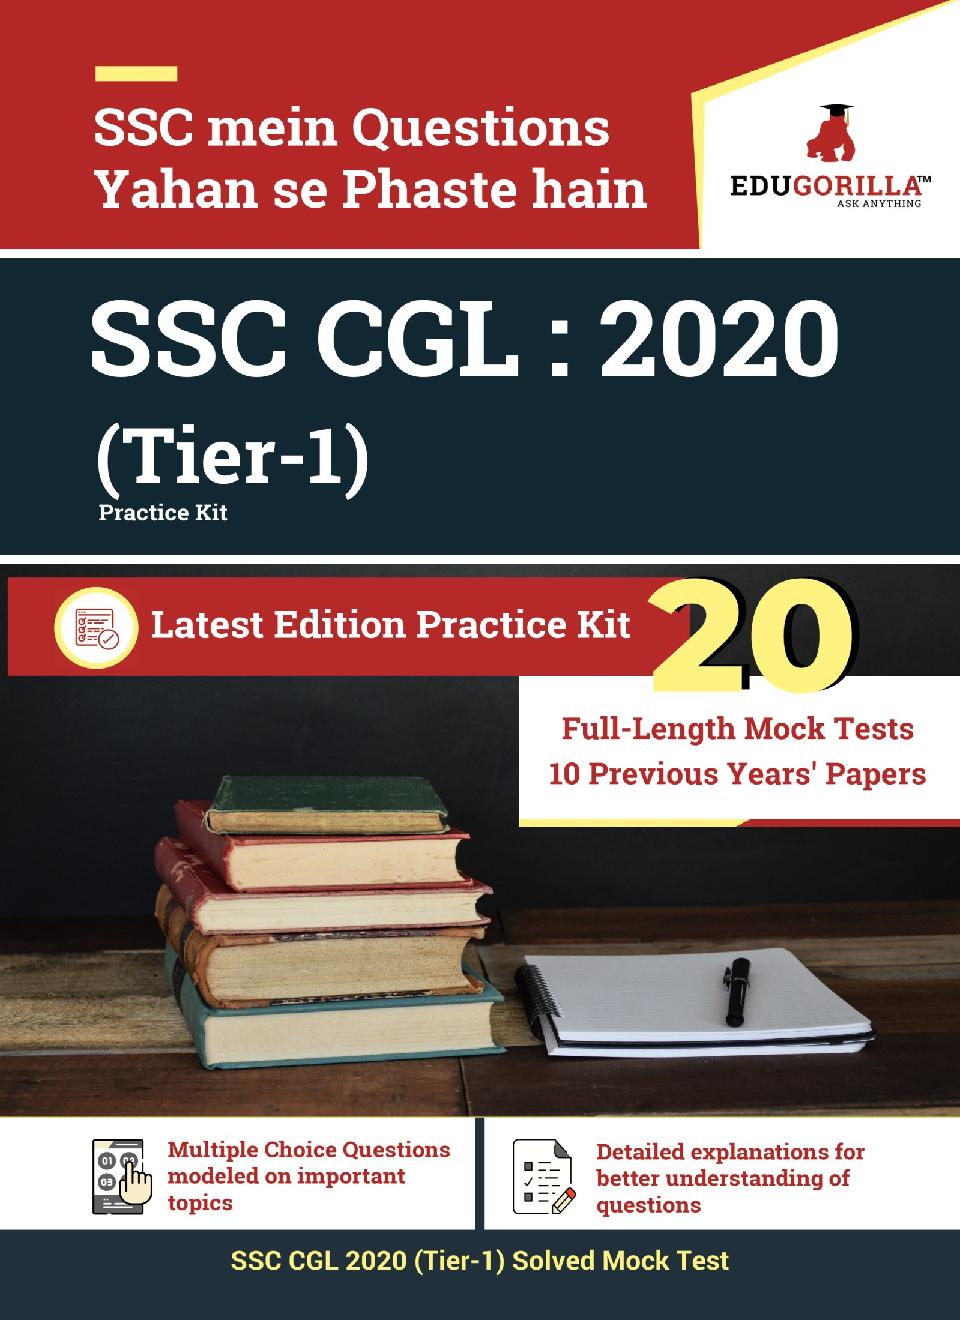 EduGorilla SSC CGL: 2020 Tier-I (Practice Kit) - Page 1